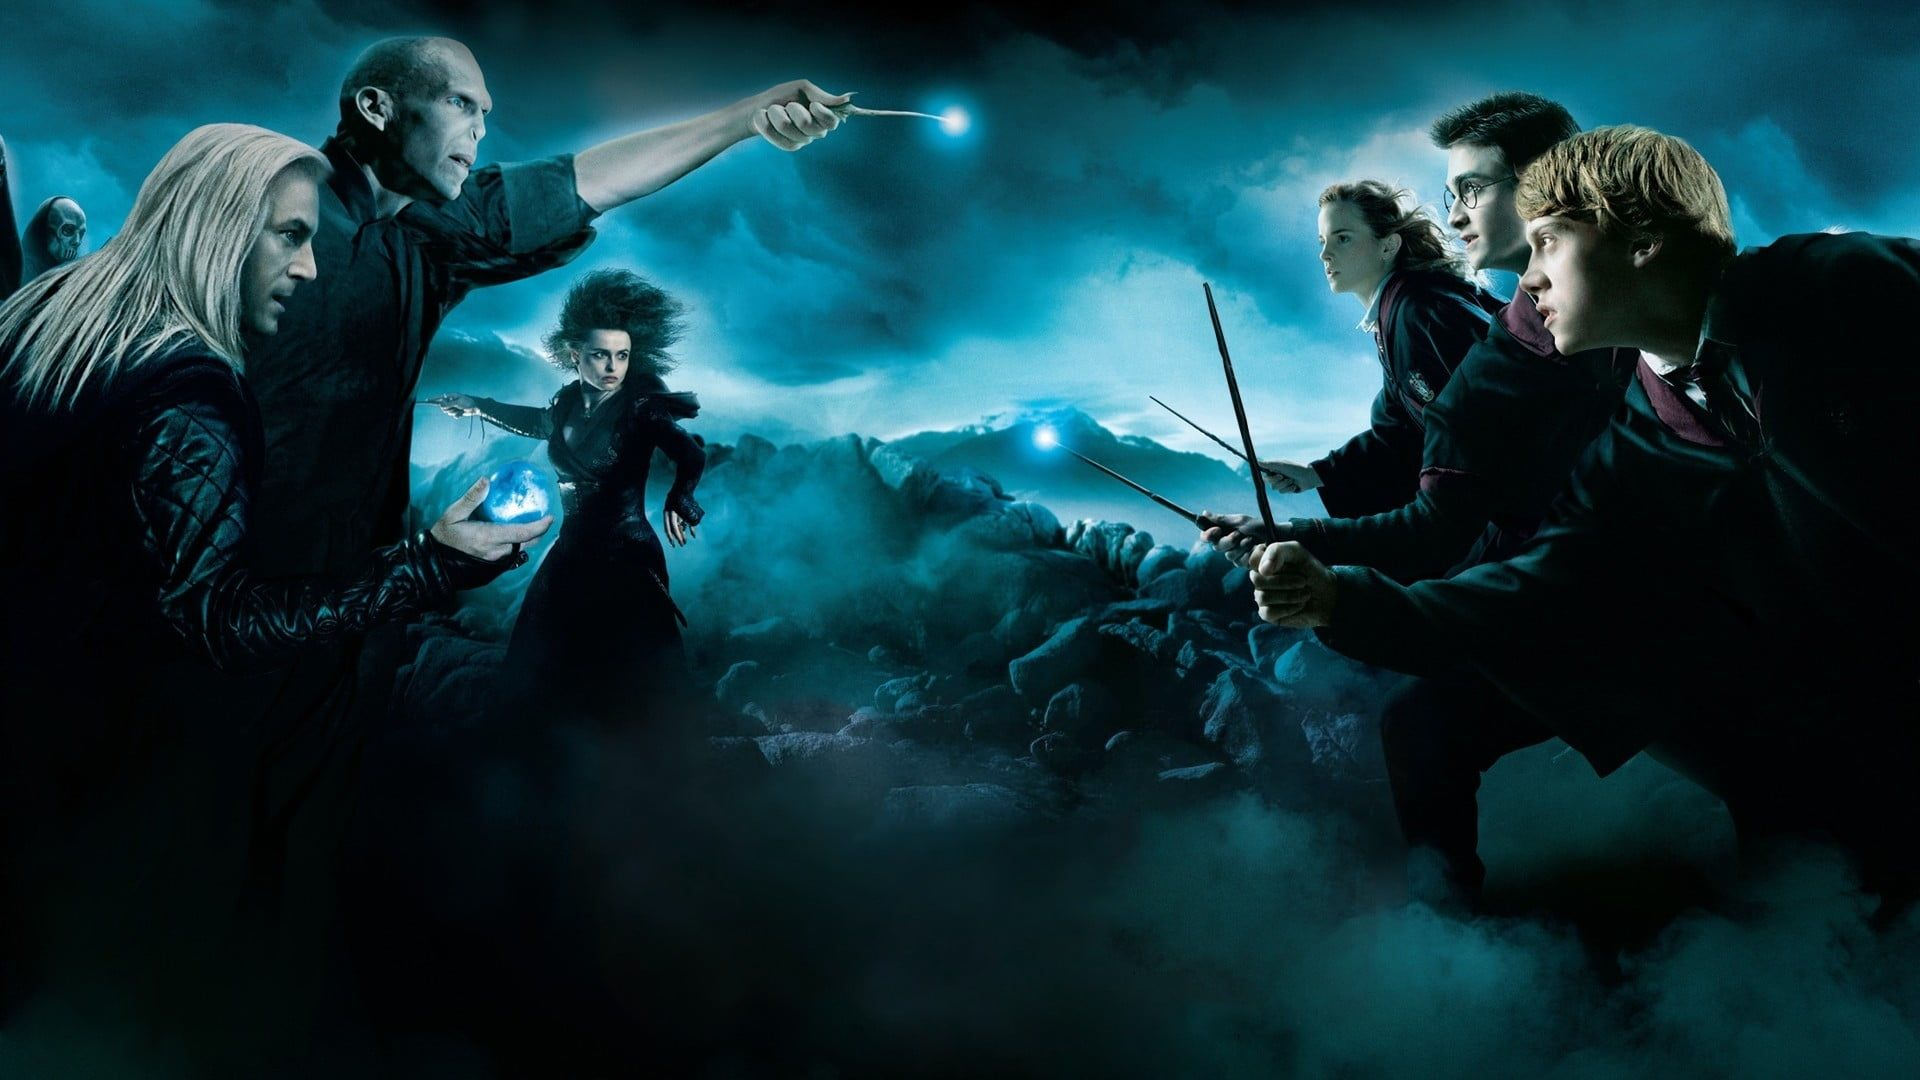 Harry Potter Wallpaper Harry Potter Lord Voldemort Lucius Malfoy Hermiona Granger Ron Weasley 1080p Wallpaper Harry Potter Wallpaper Voldemort Lord Voldemort